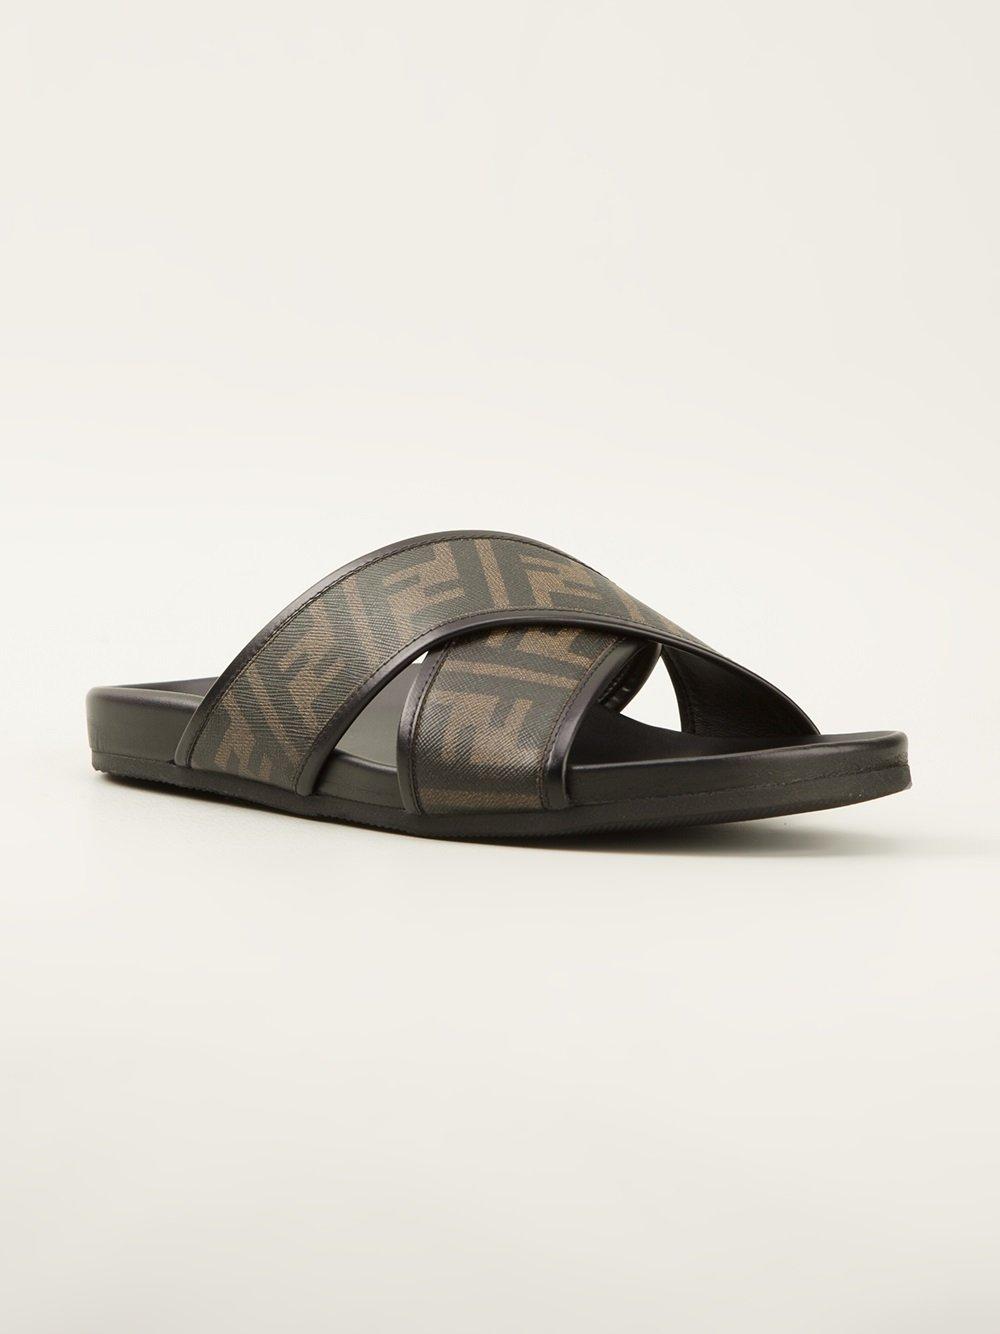 Fendi Zucca Sandals In Black For Men Lyst